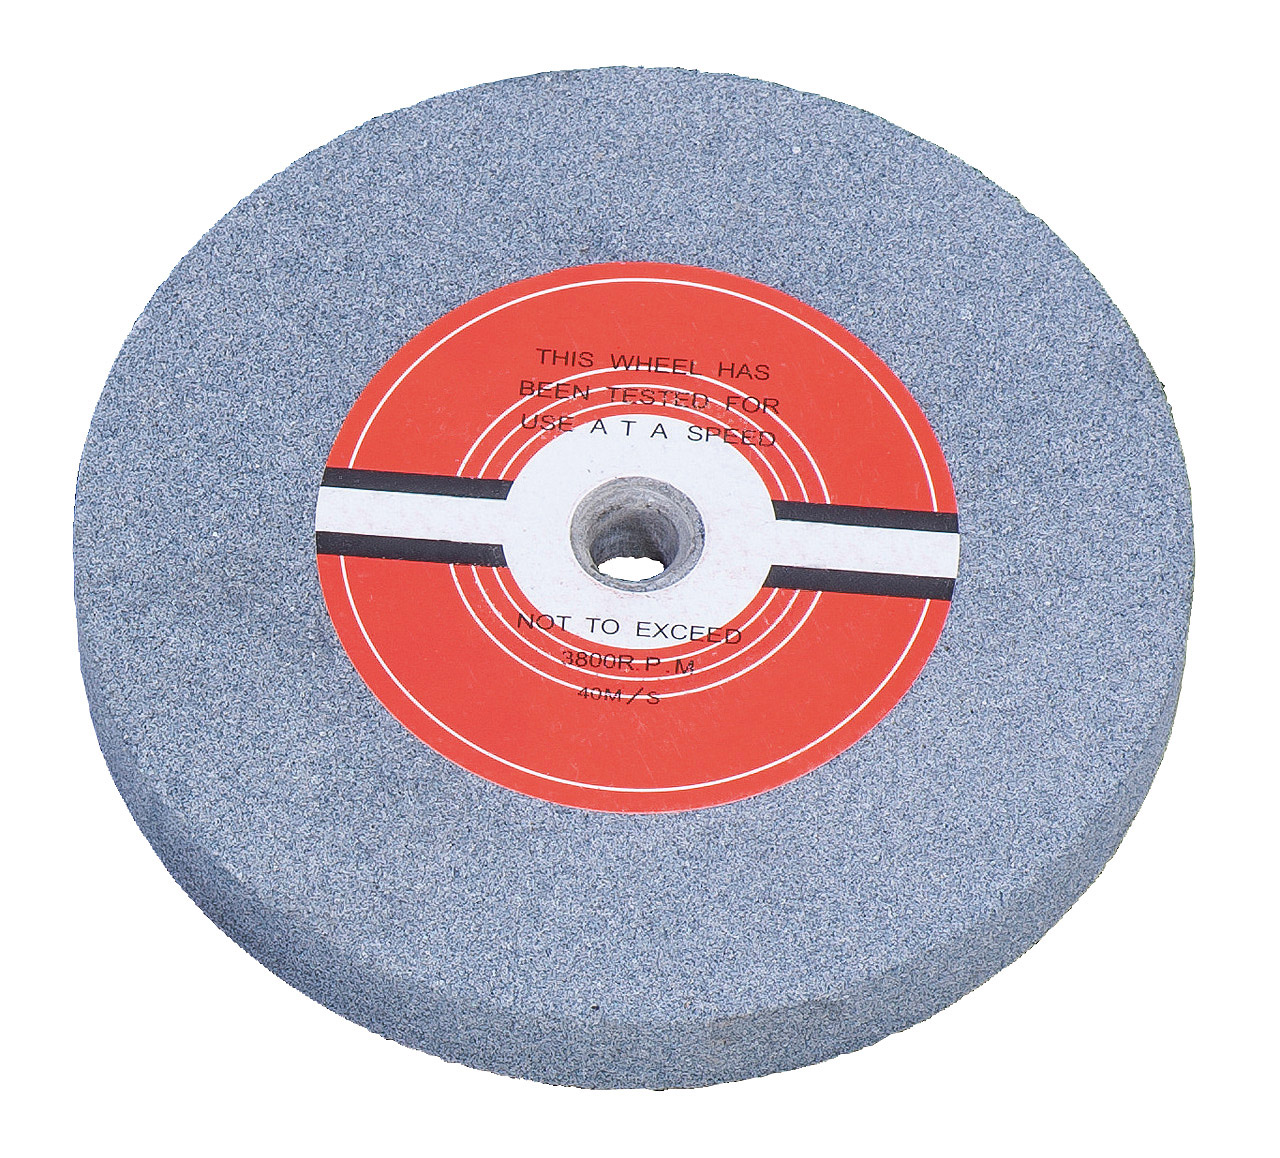 Tarcza szlifierska (tlenek glinu) miękka Ø 300 x 50 mm, Ø 75 mm, G 80    BERNARDO